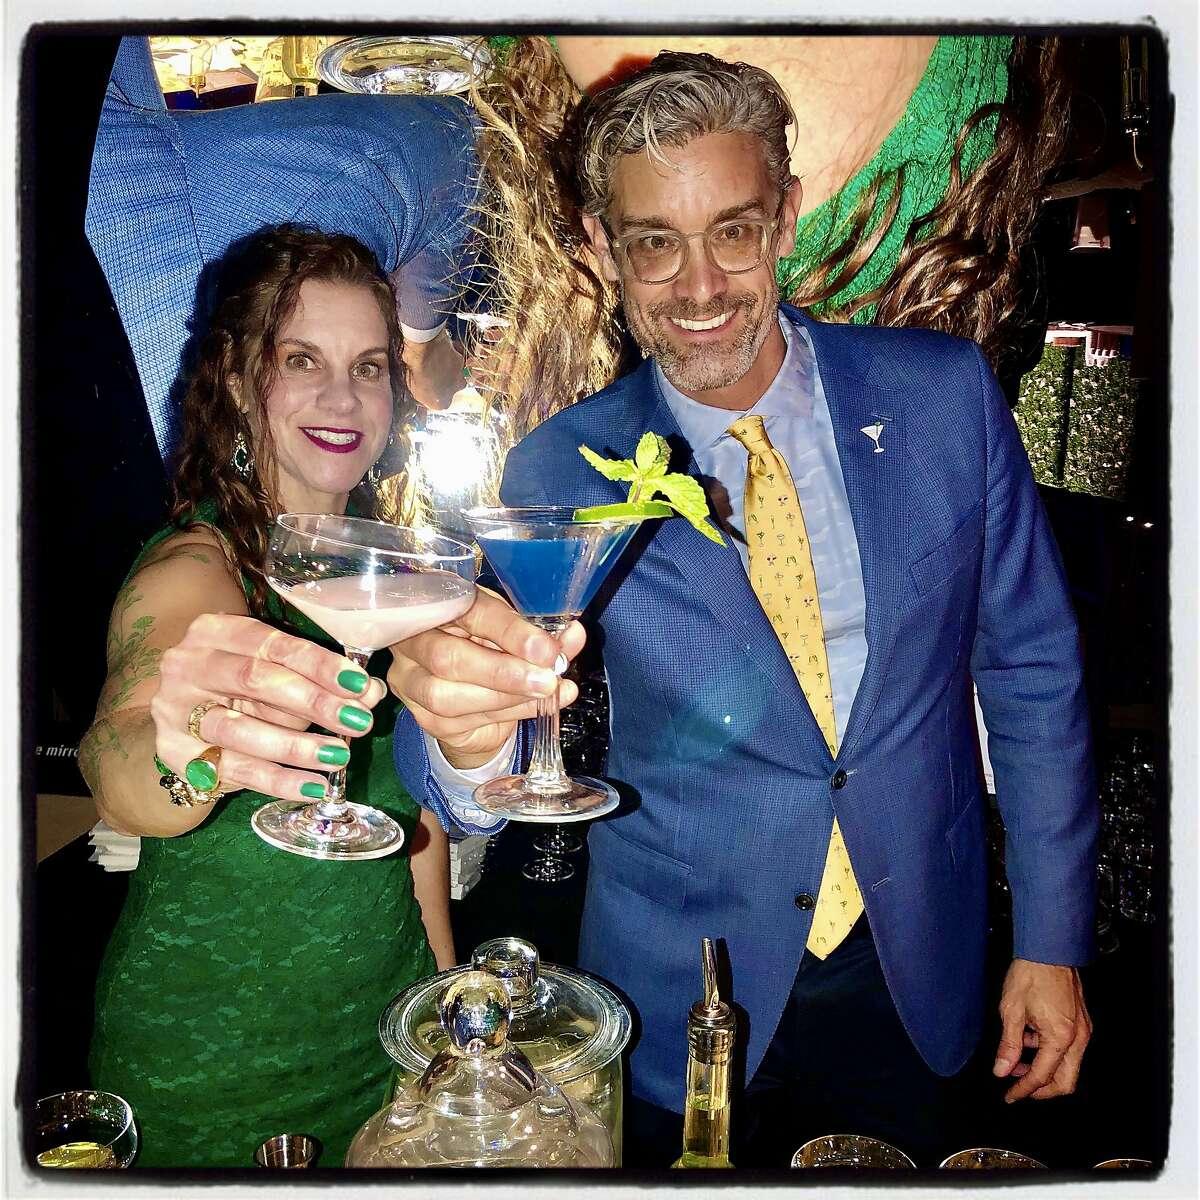 Absinthia Vermut (left) with Exploratorium Director Chris Flink at the Science of Cocktails fundraiser. Feb. 7, 2020